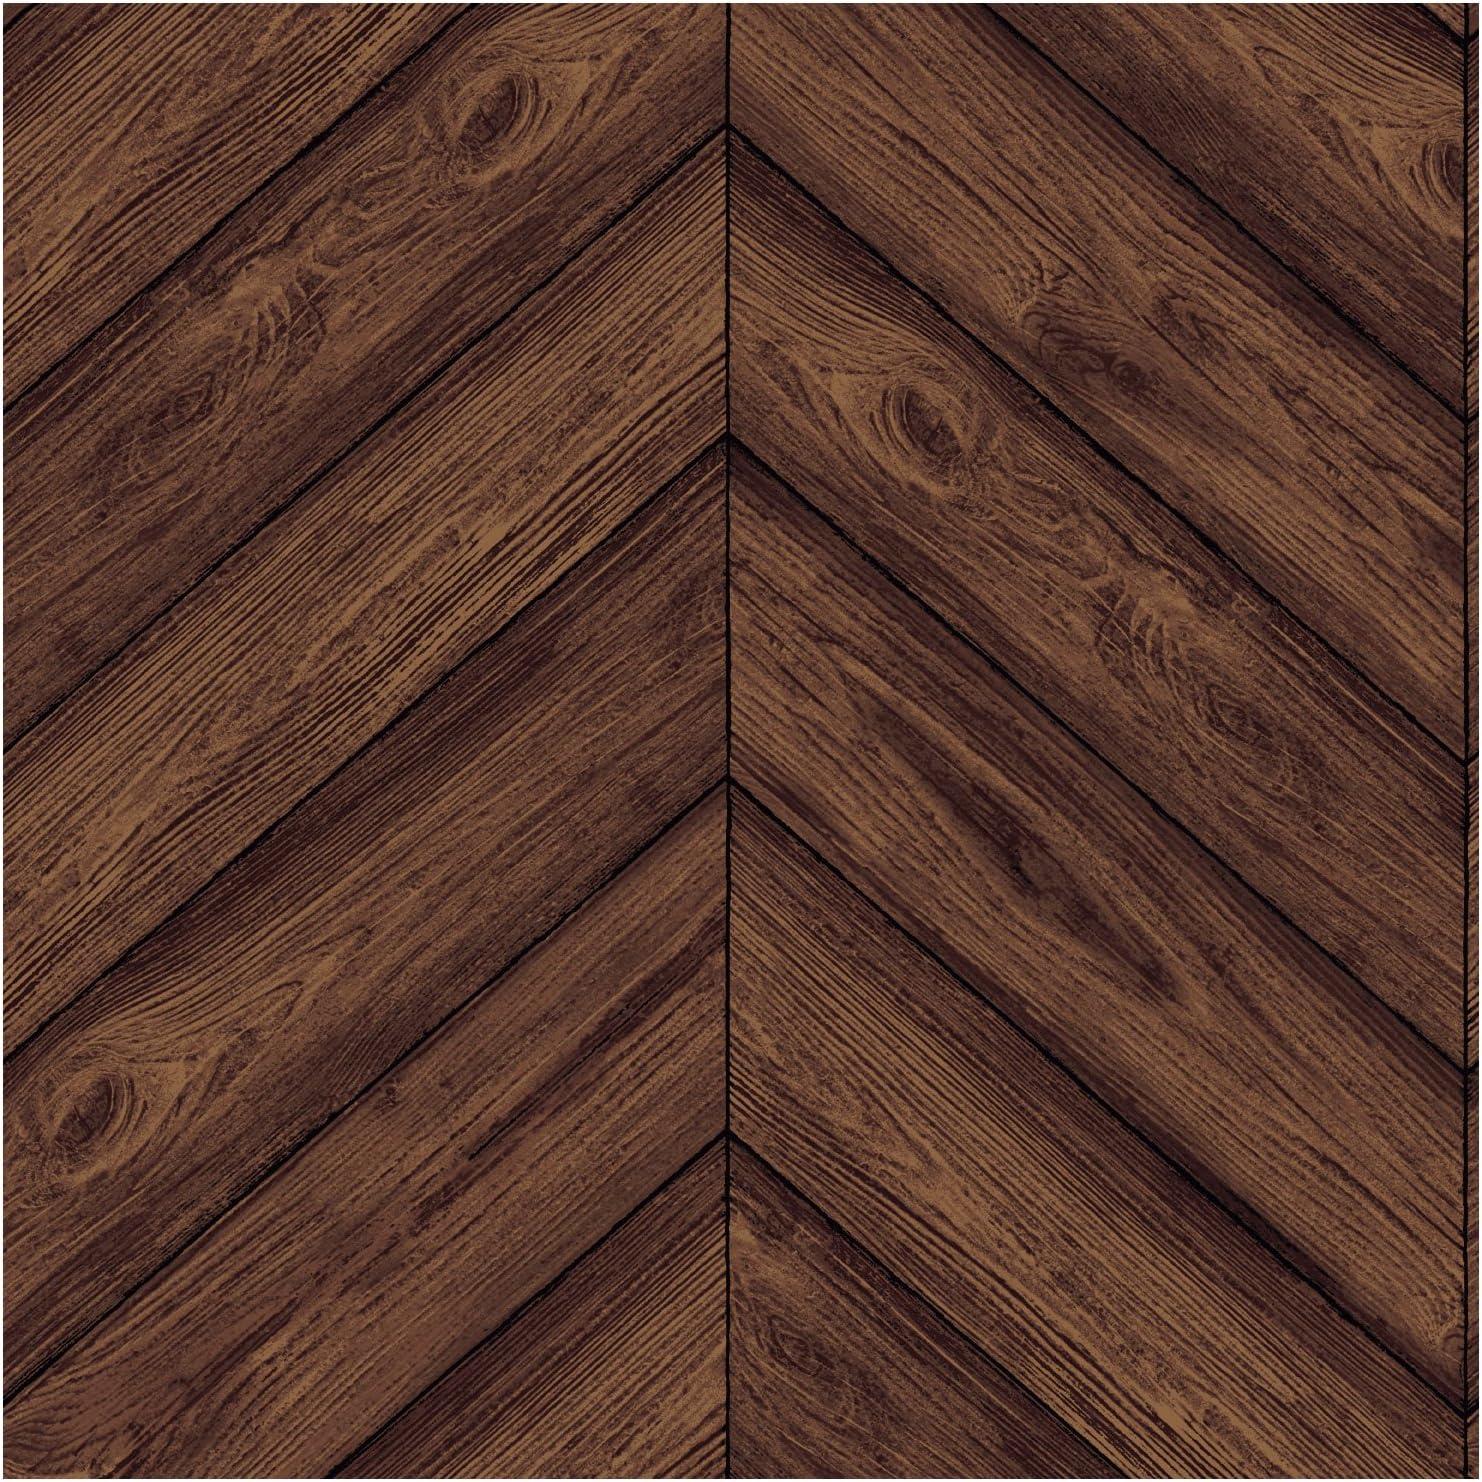 Tempaper Walnut Herringbone Designer Removable Peel And Stick Wallpaper Amazon Com